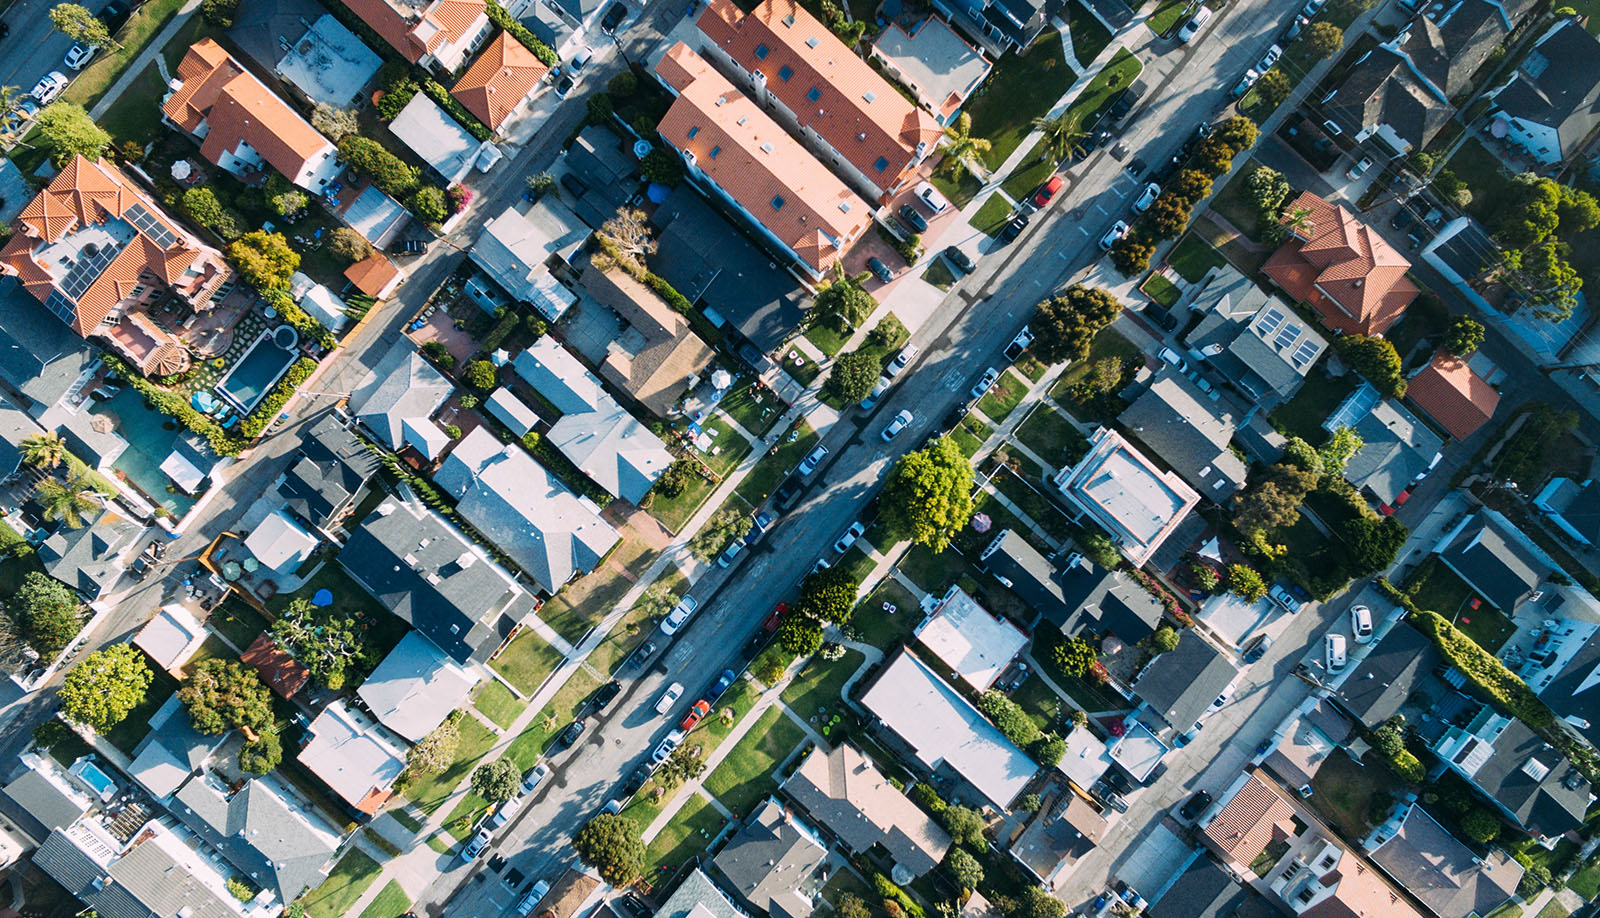 Will My Neighbourhood Go Up in Value?